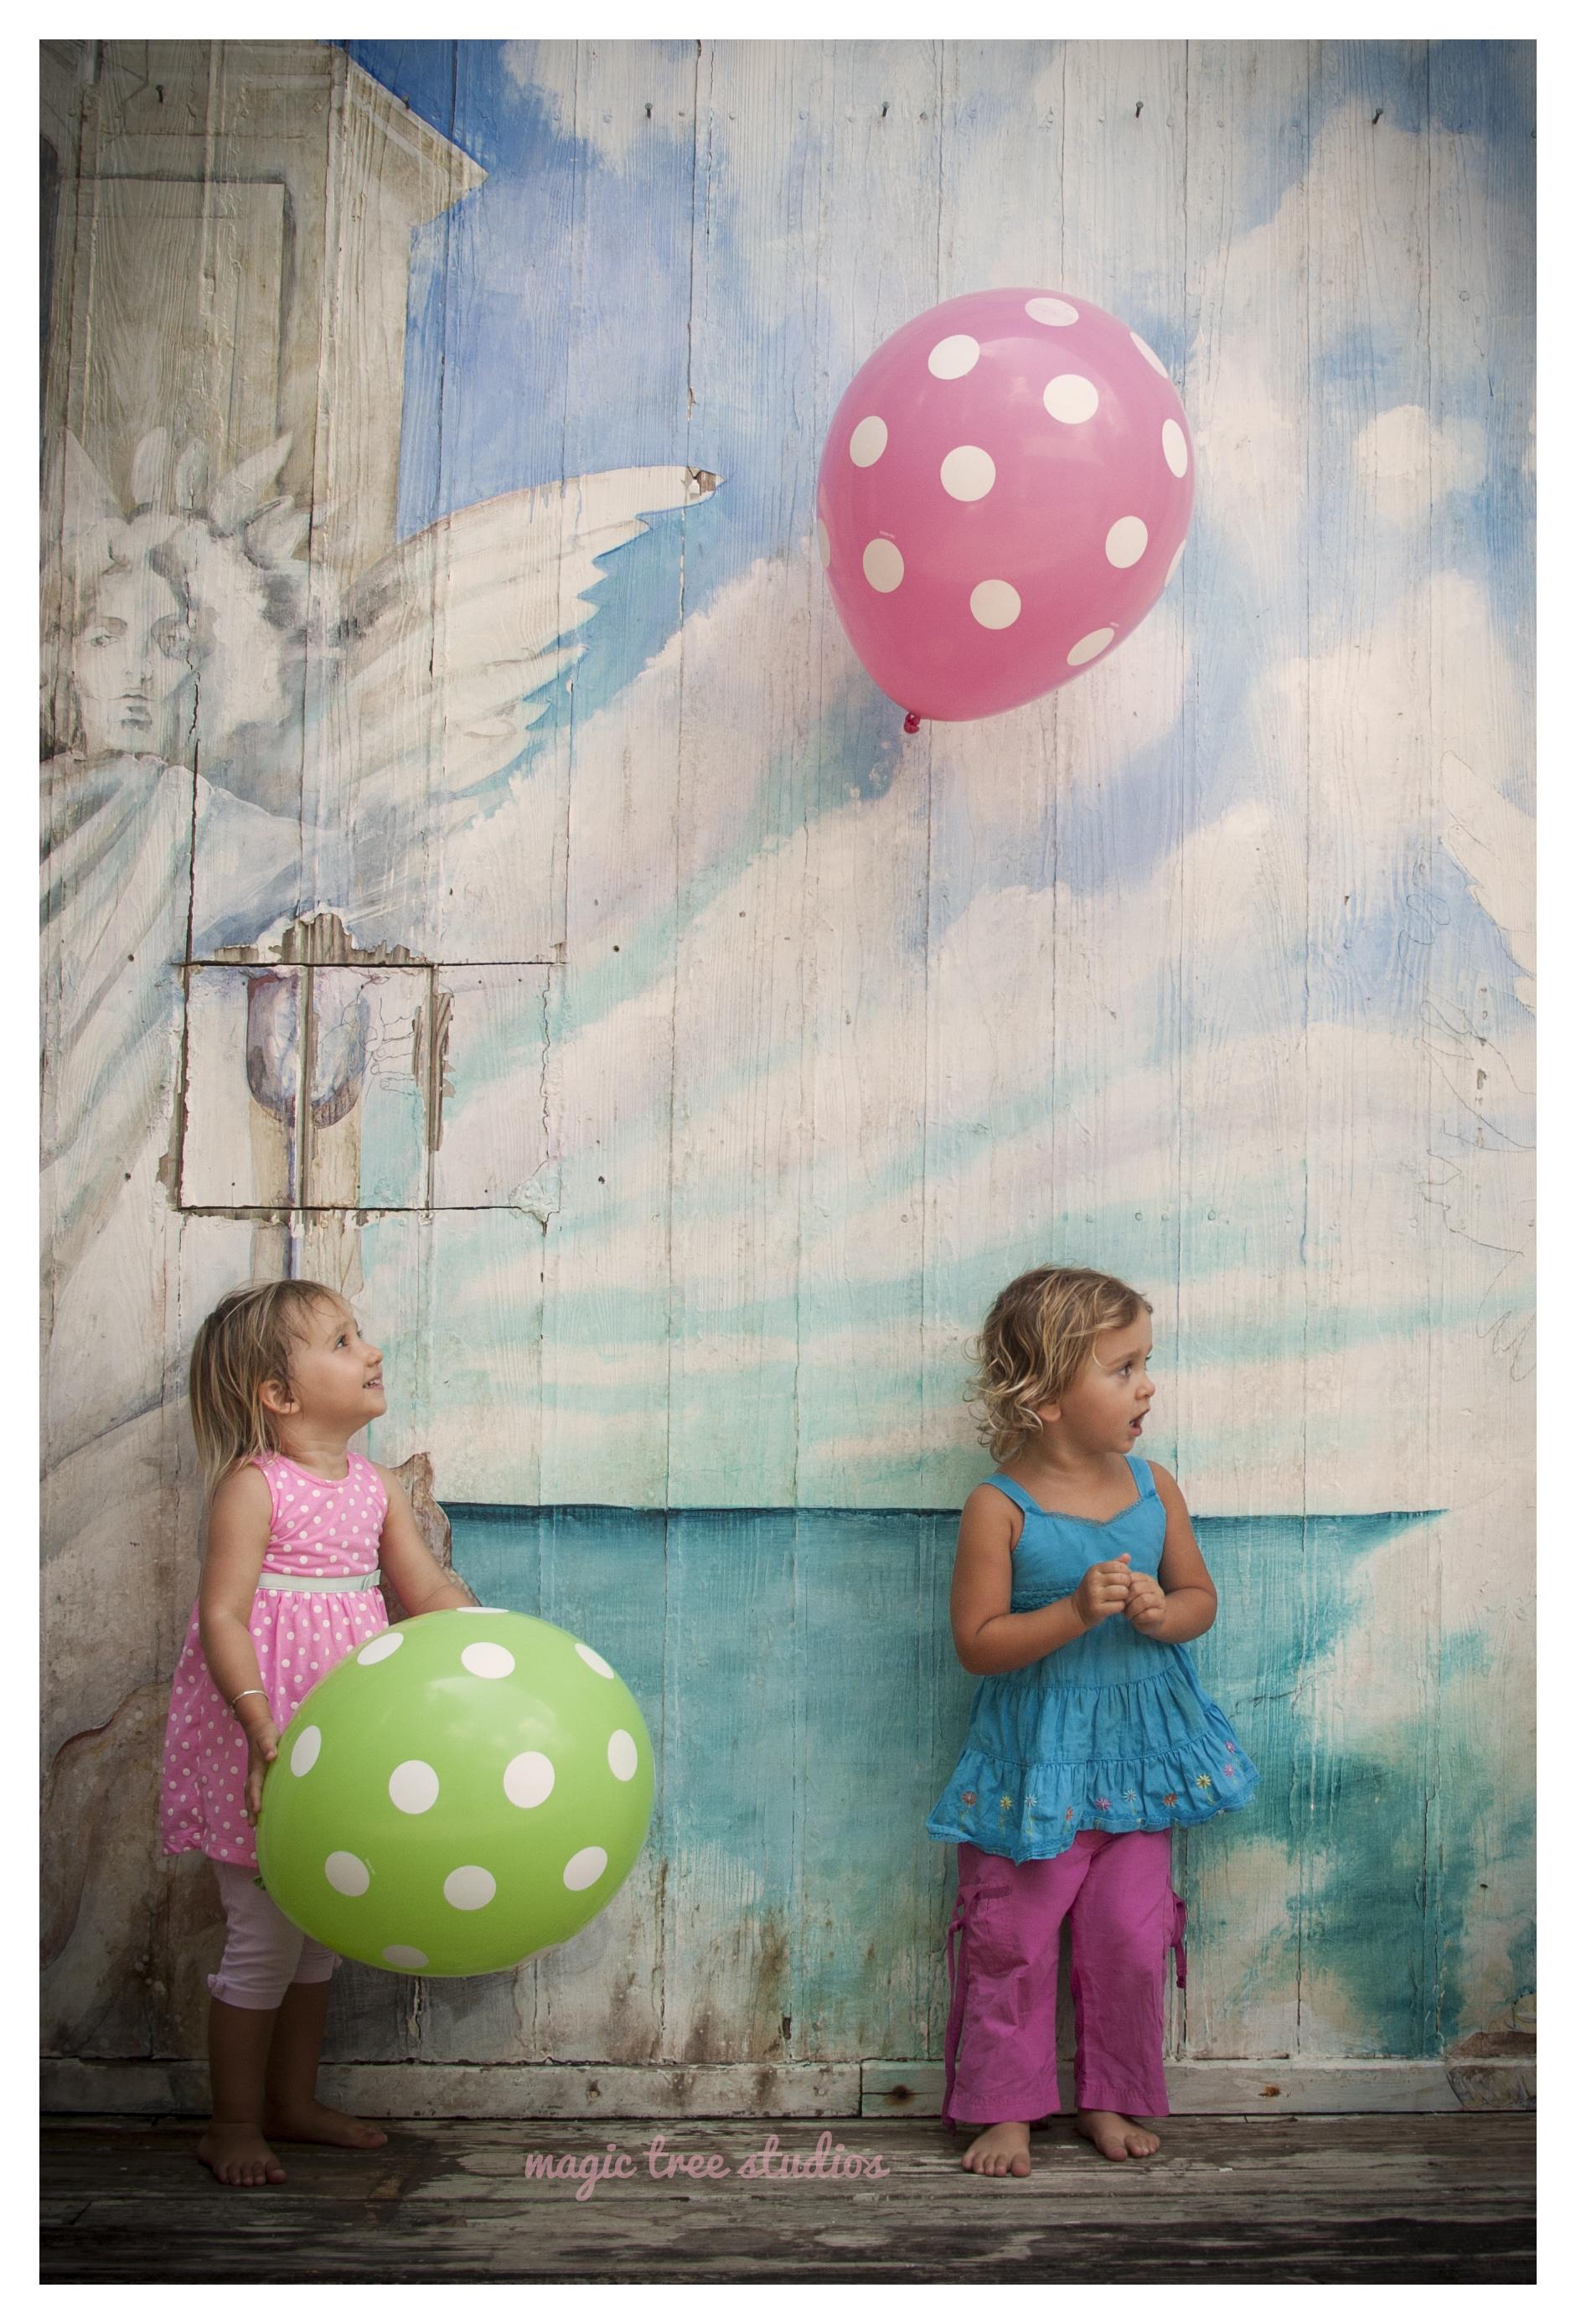 sophia and tashi and balloons for web.jpg